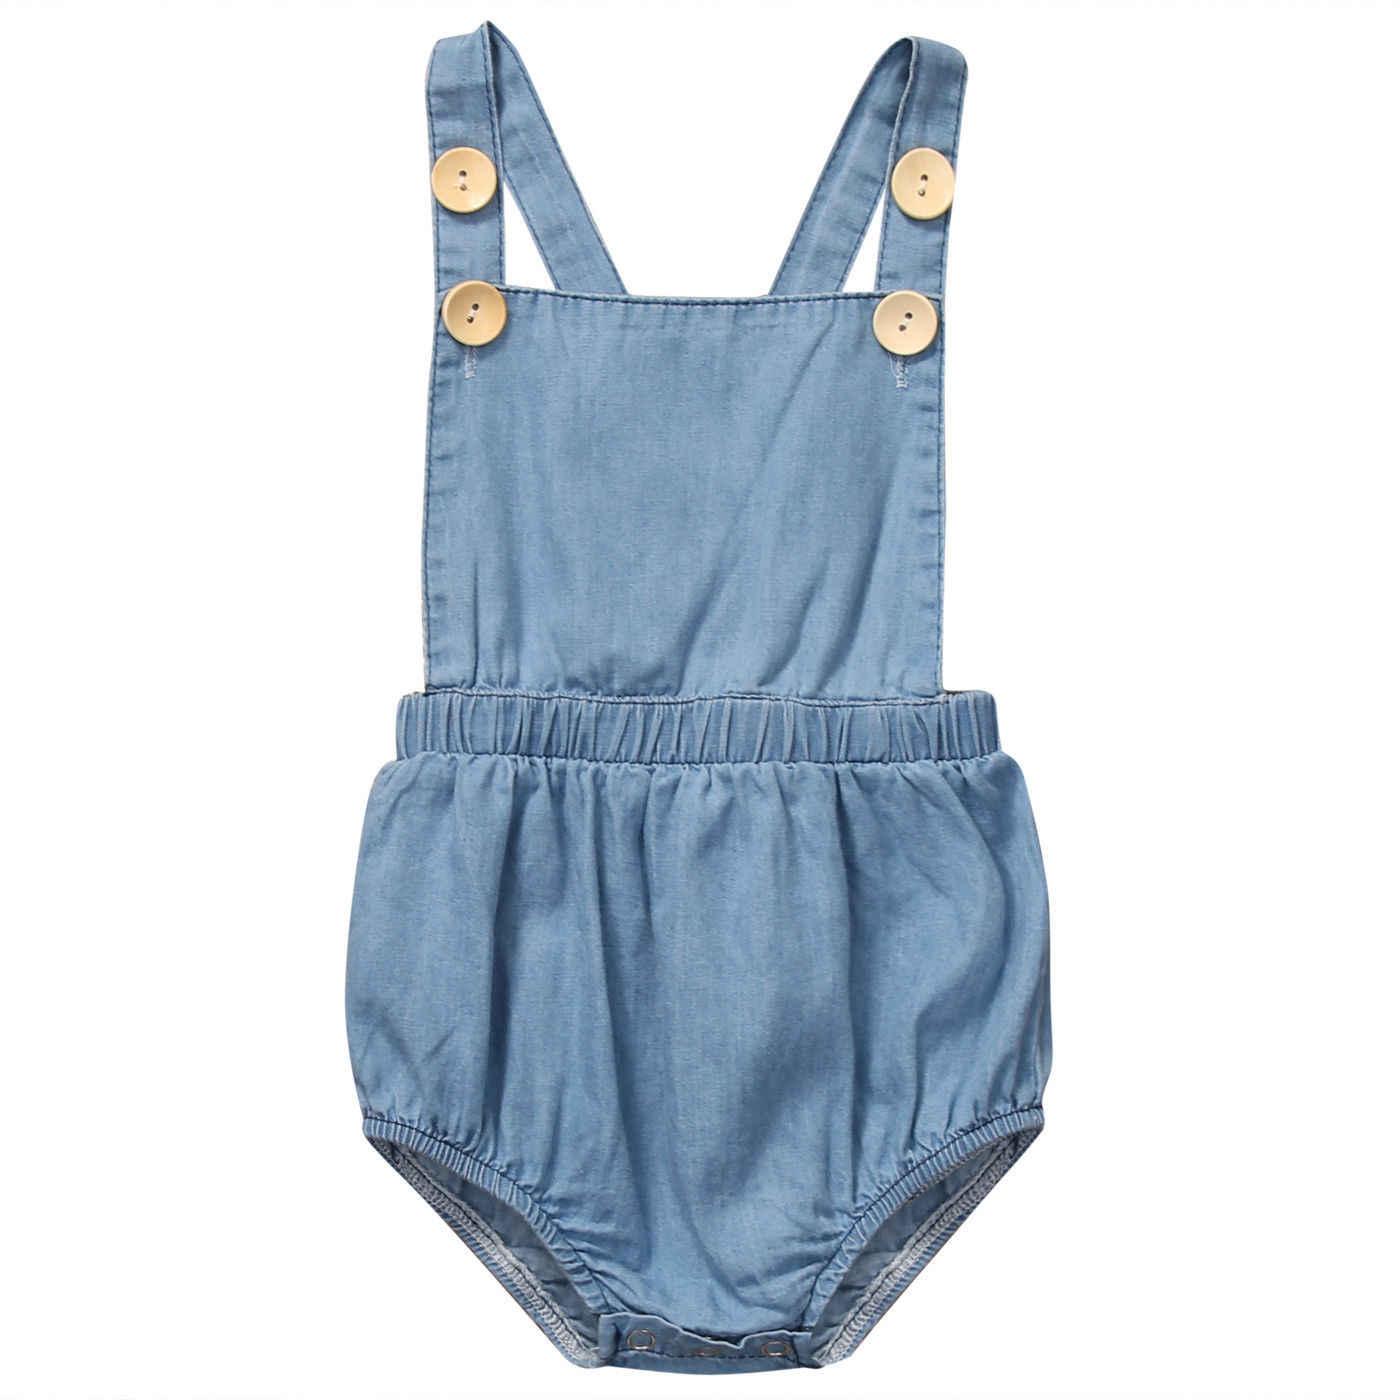 5b0bfe068283 Detail Feedback Questions about Newborn Baby Girl Romper Denim ...